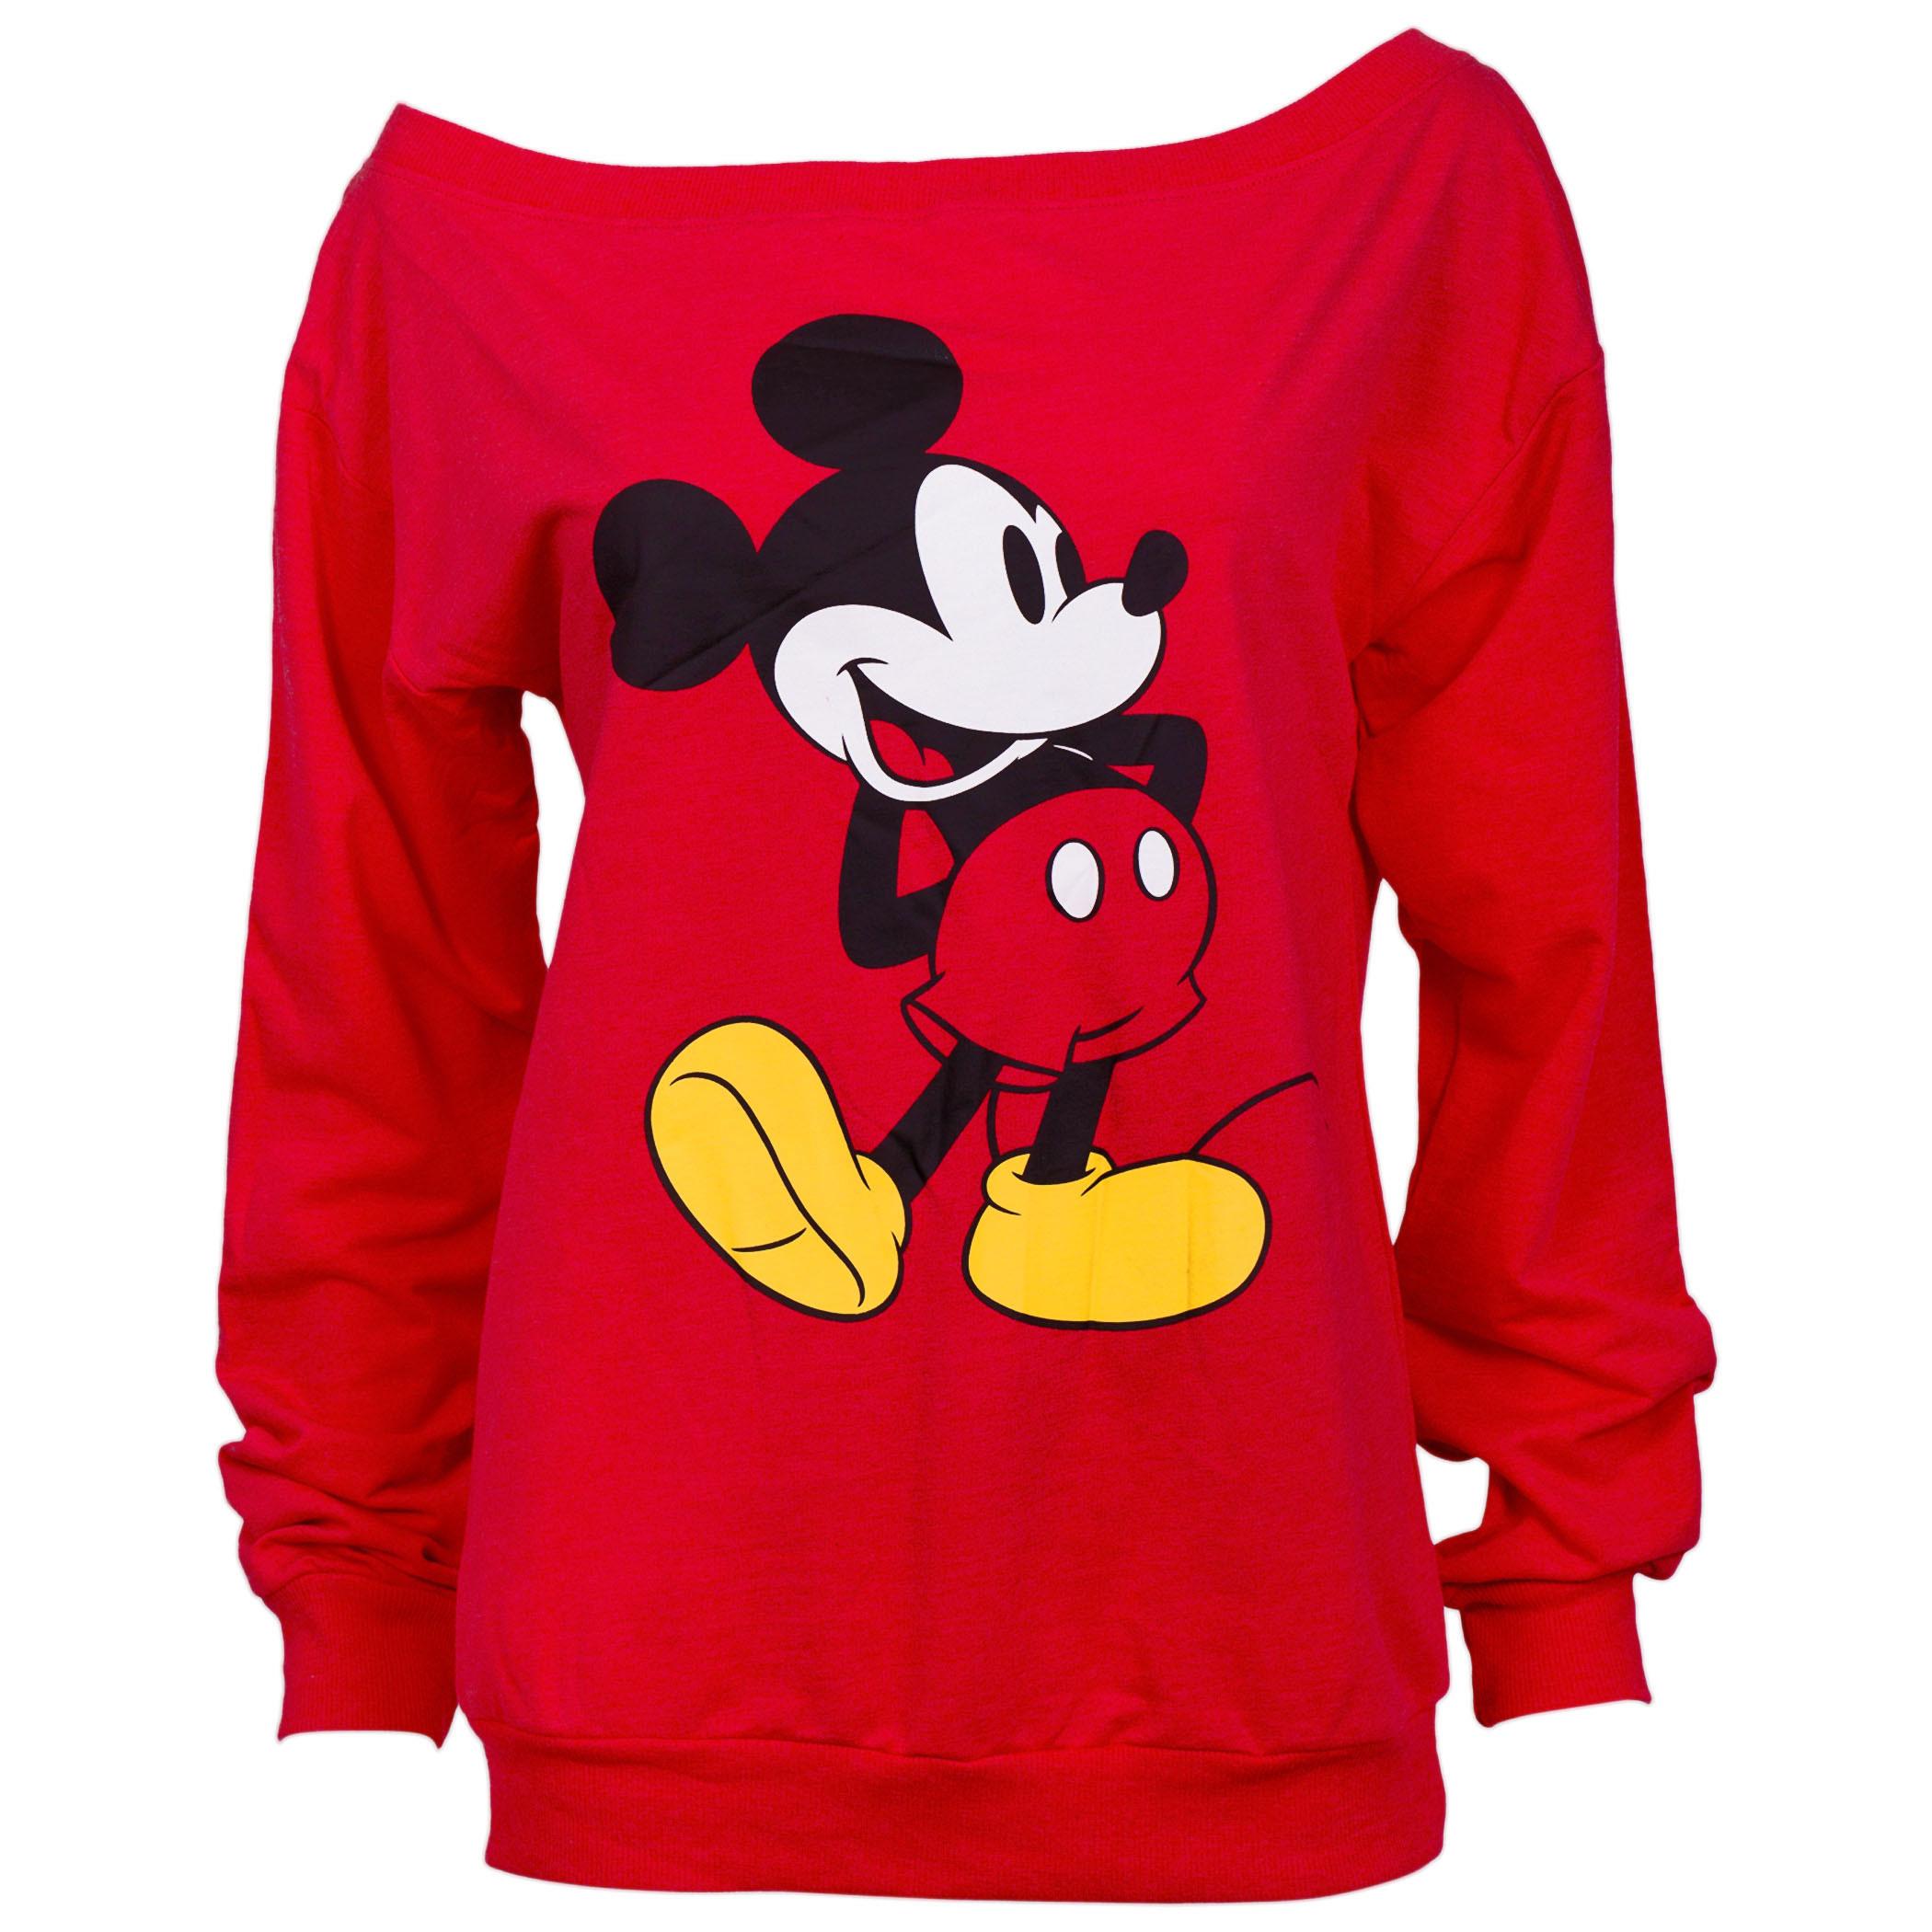 Disney Mickey Mouse Slouched Women's Sweatshirt